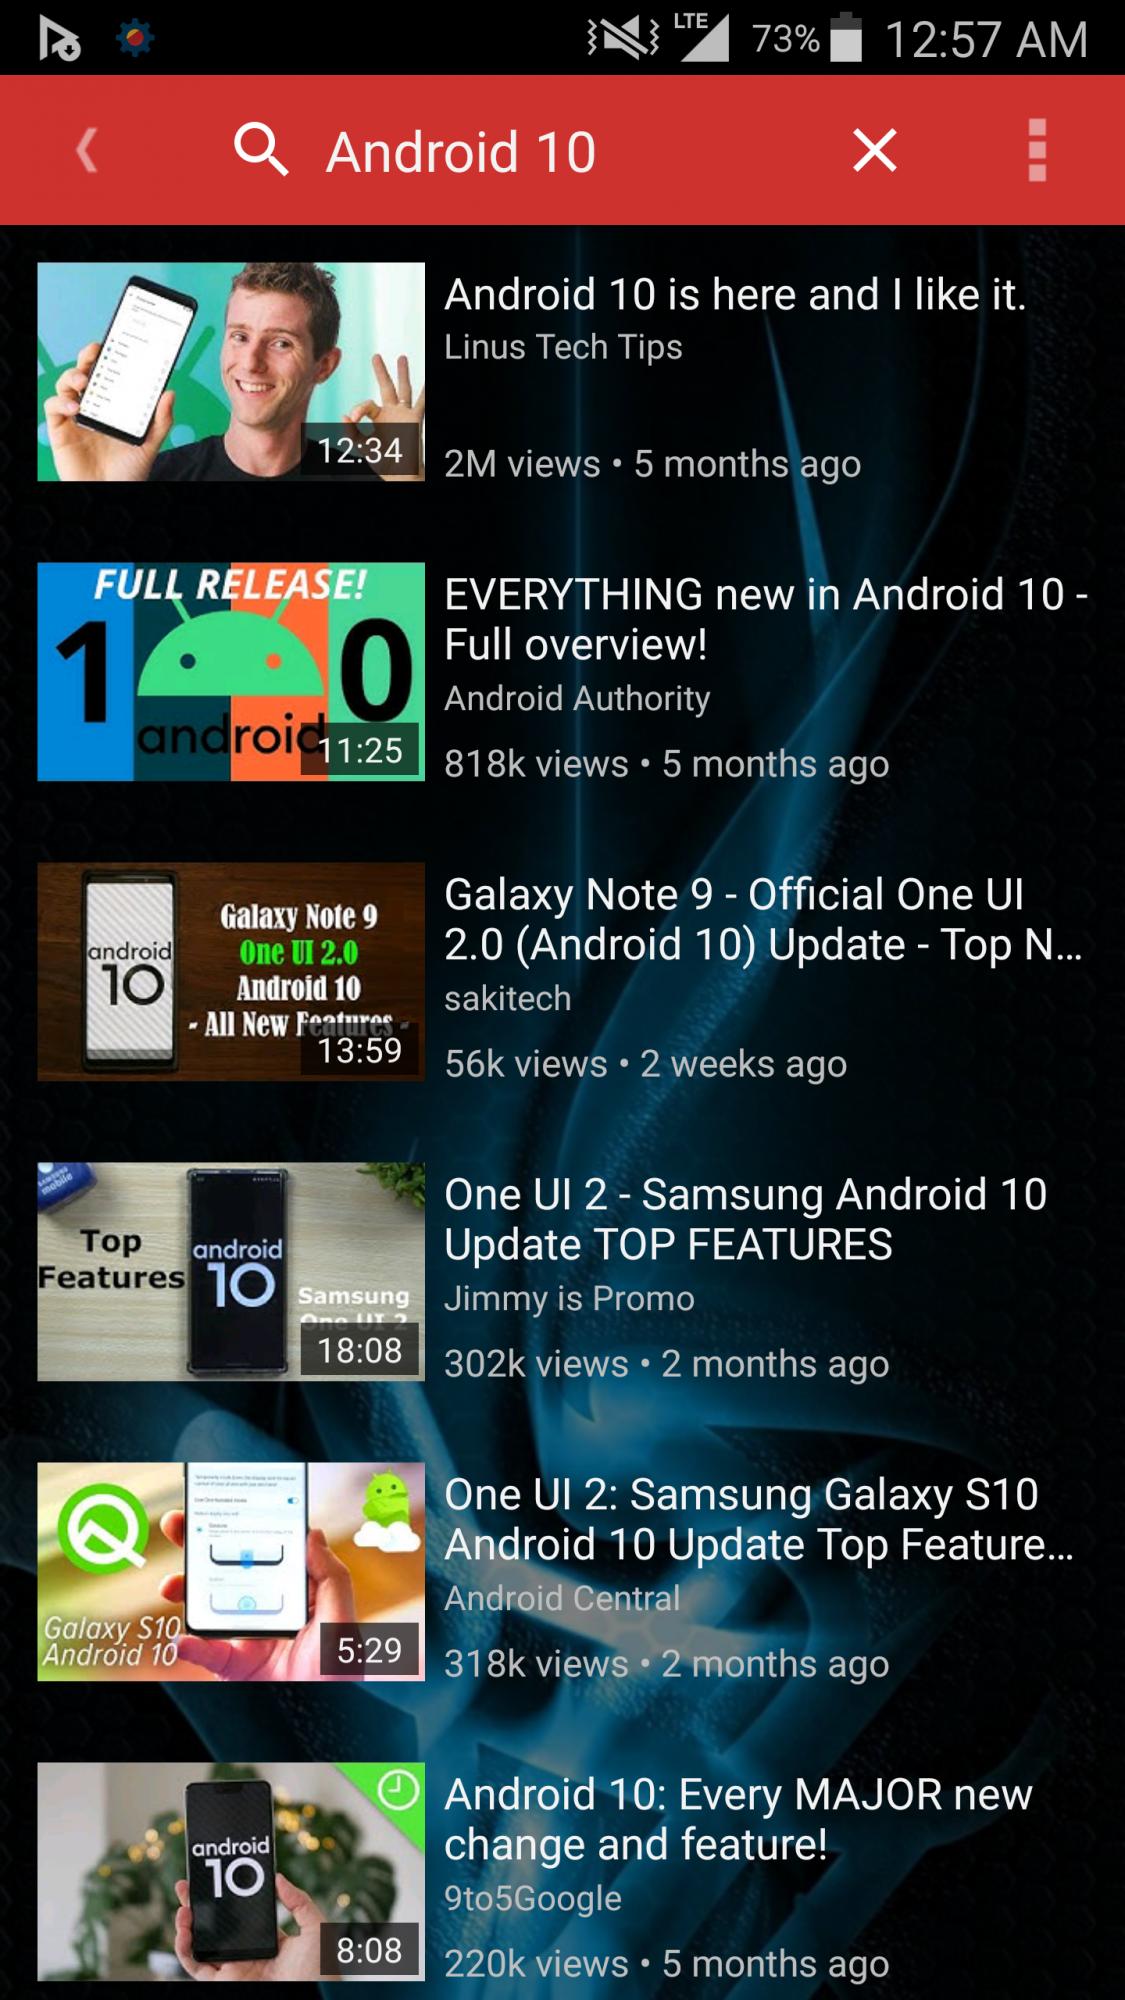 Screenshot_2020-02-25-00-57-59.png